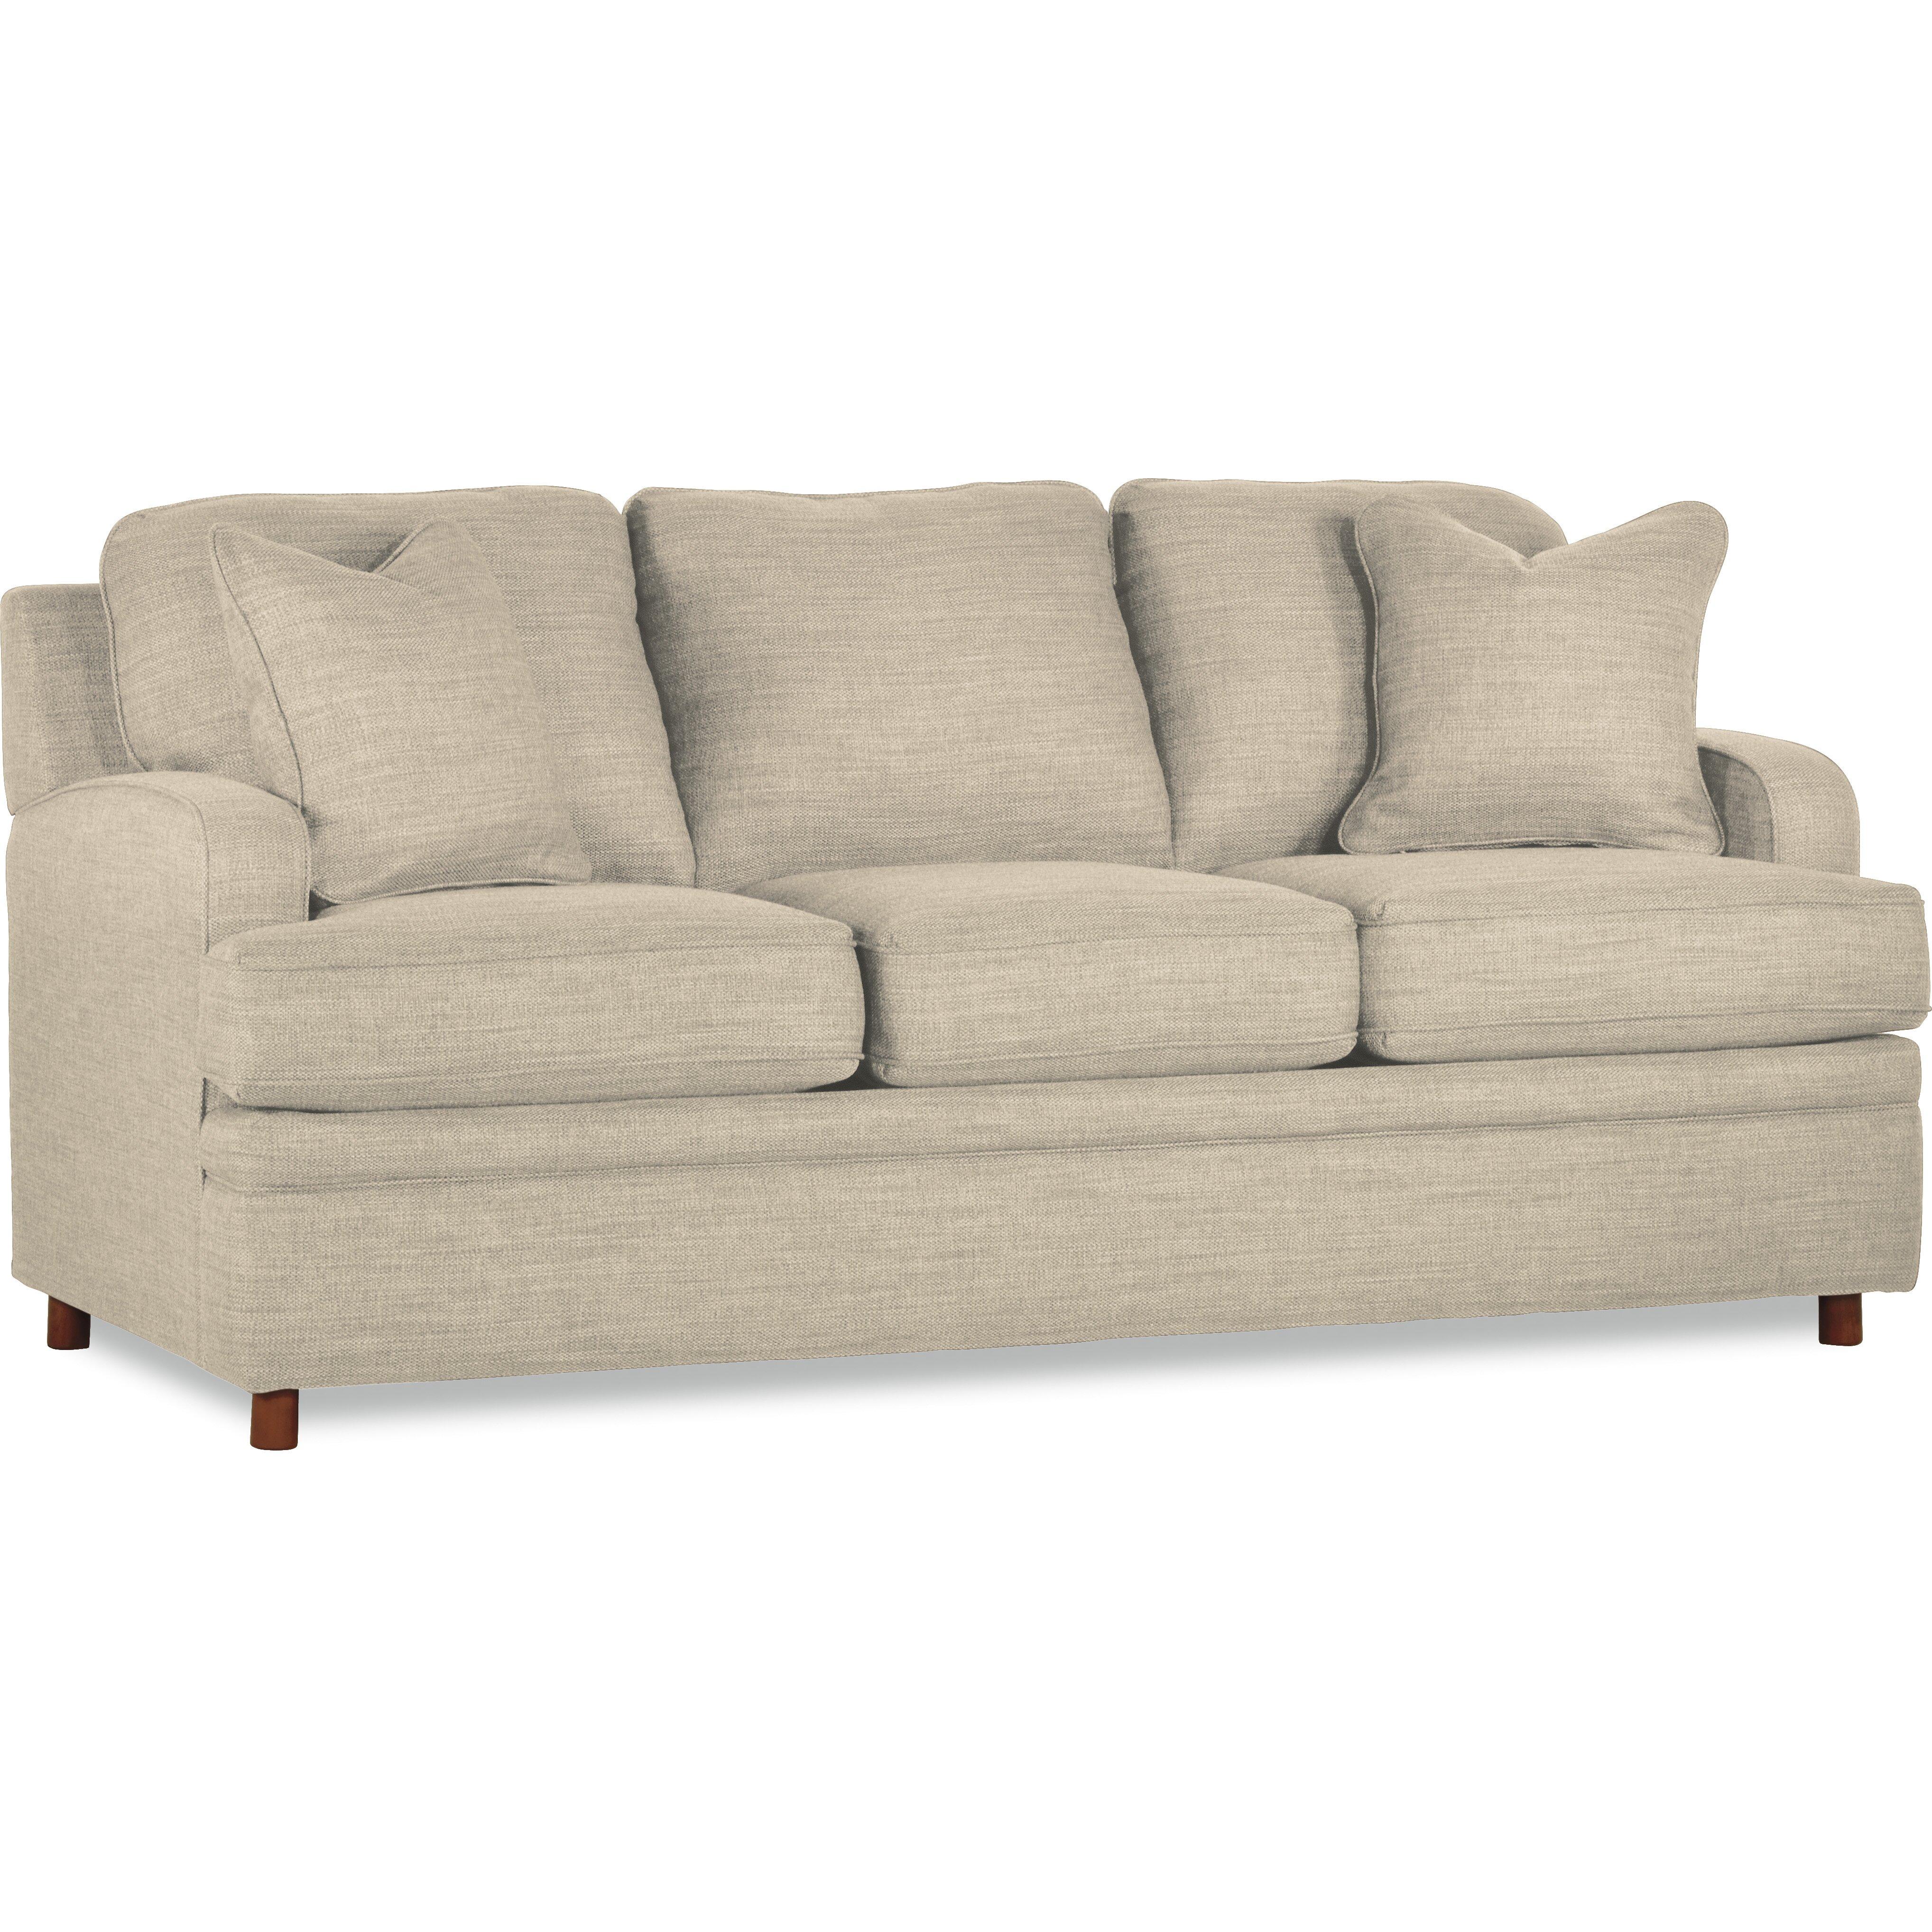 Lazy Boy Sleeper Sofa Home Decor